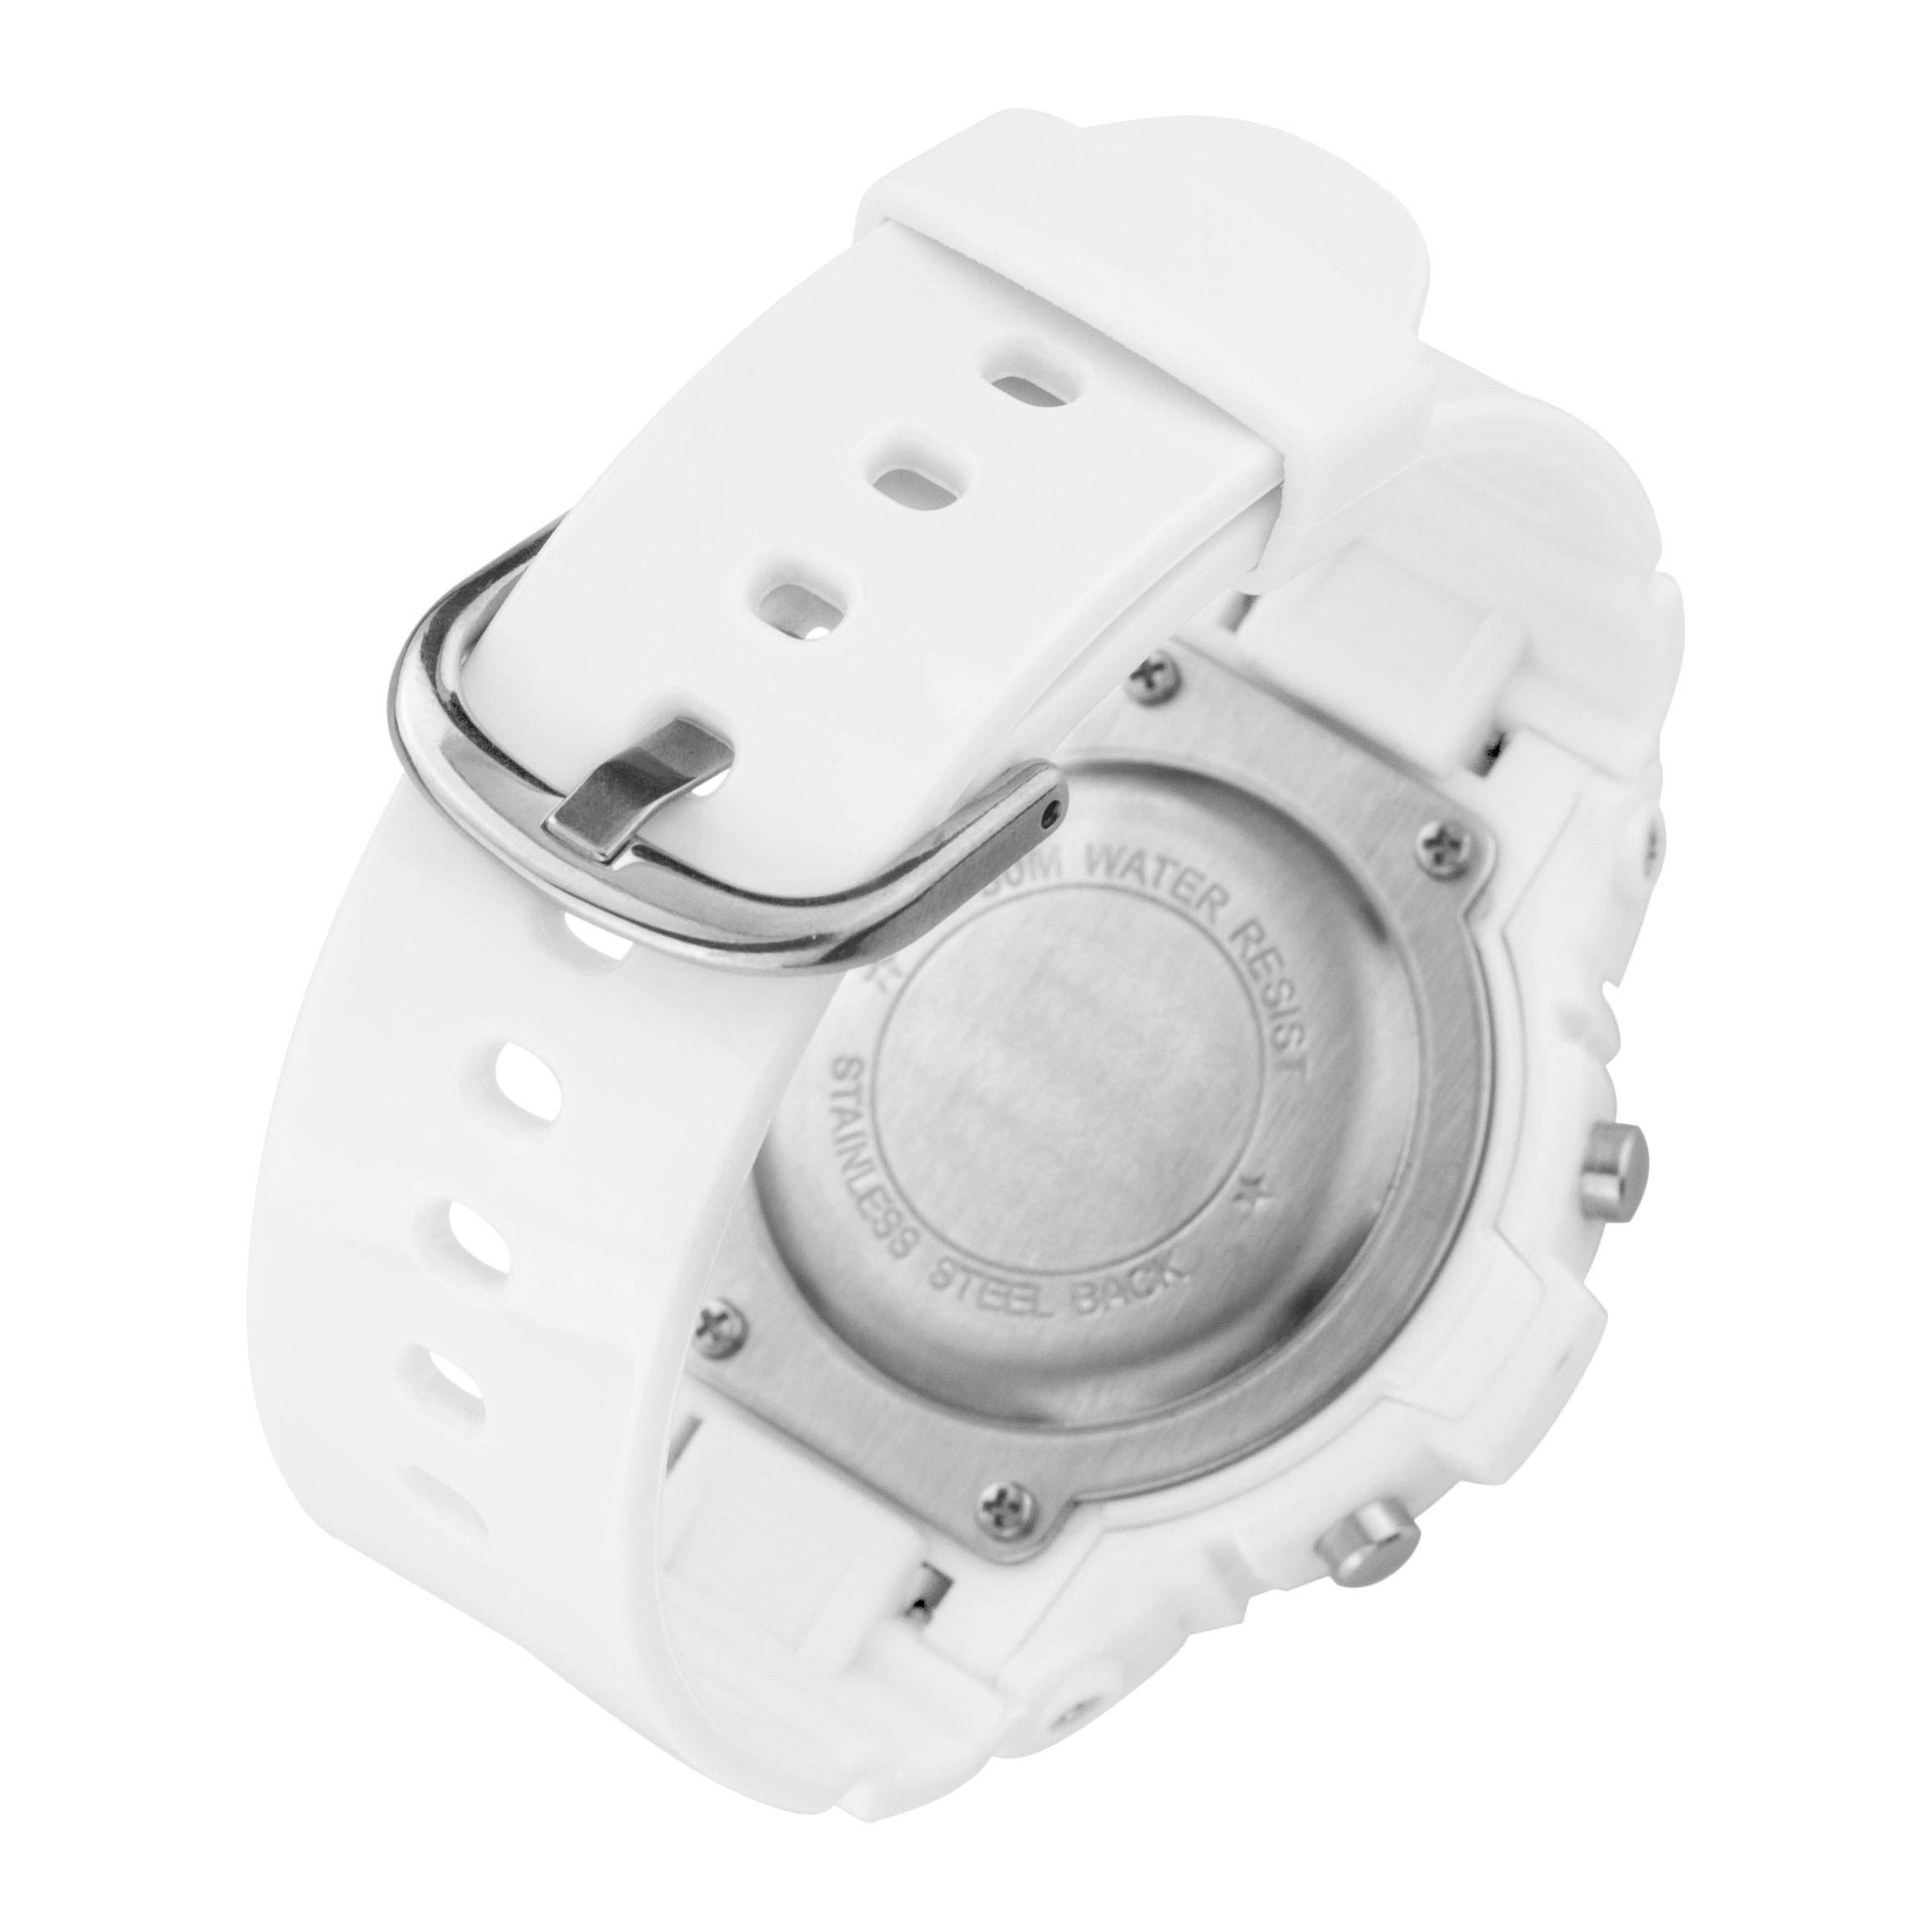 Kids Digital Sport Watch Outdoor Waterproof Watch with Alarm for Kid Child Boy Girls Gift LED Kids Watch